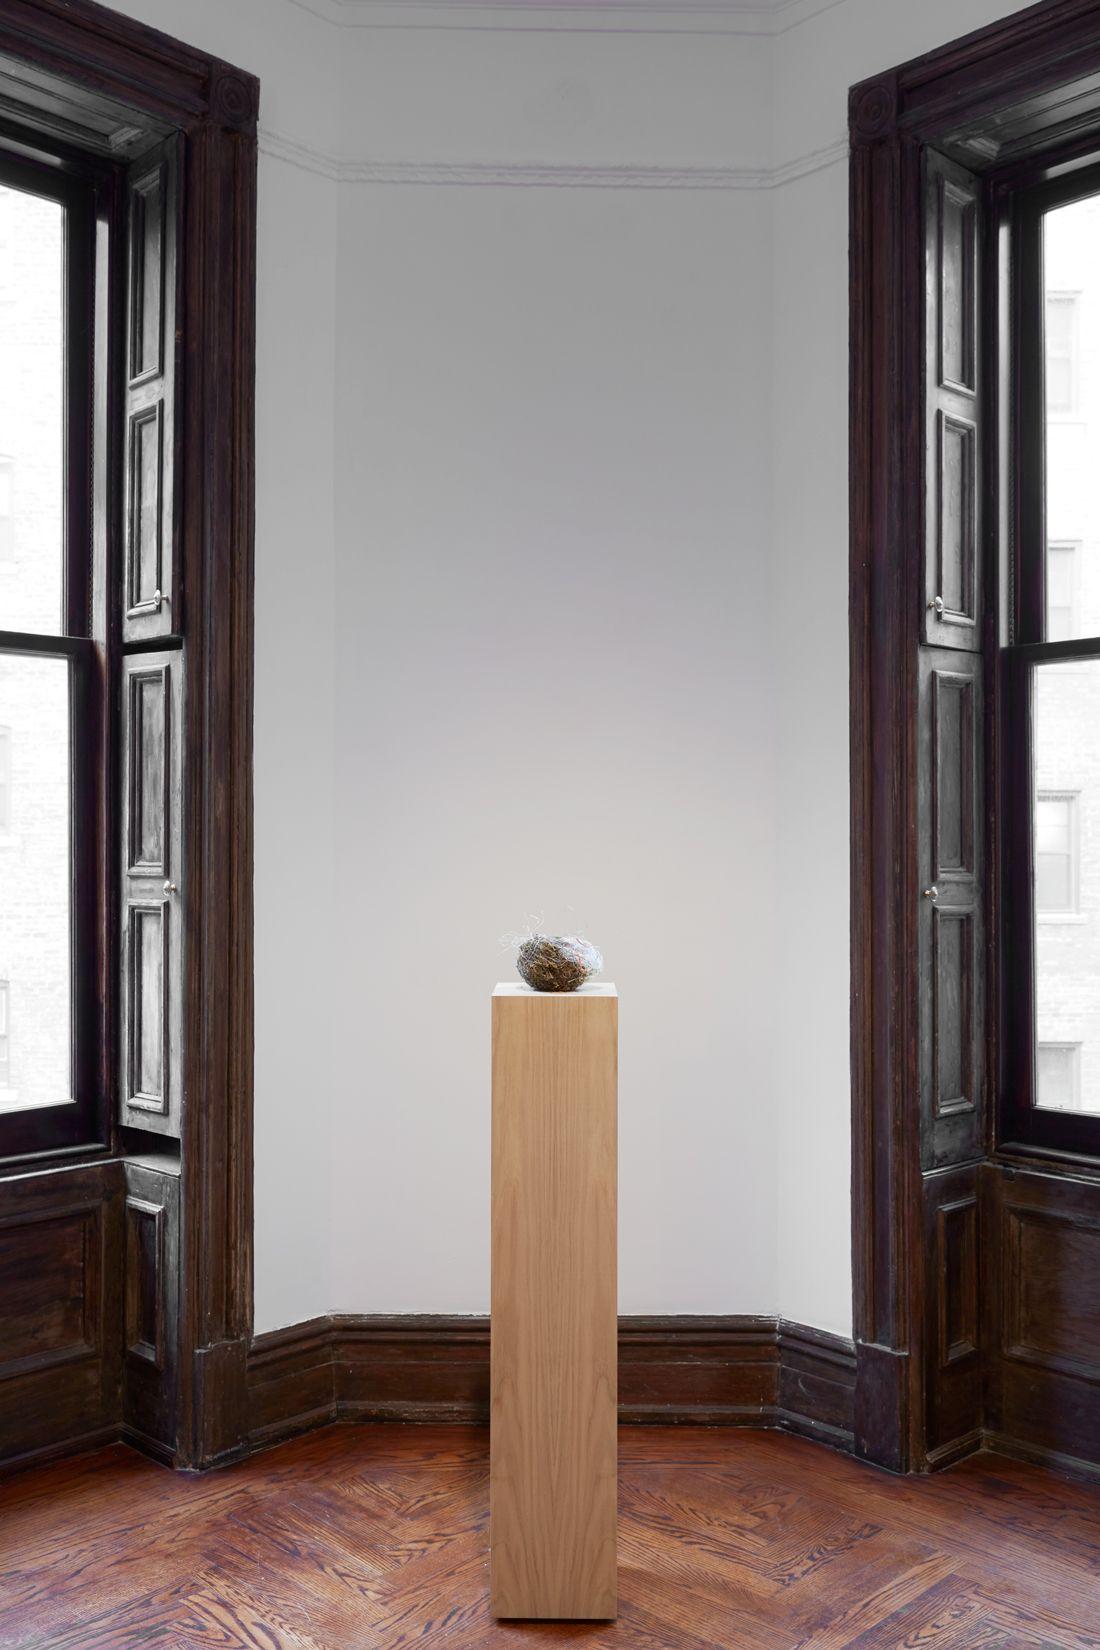 Jump Cut(Installation View), Marianne Boesky Gallery, Uptown, 2013